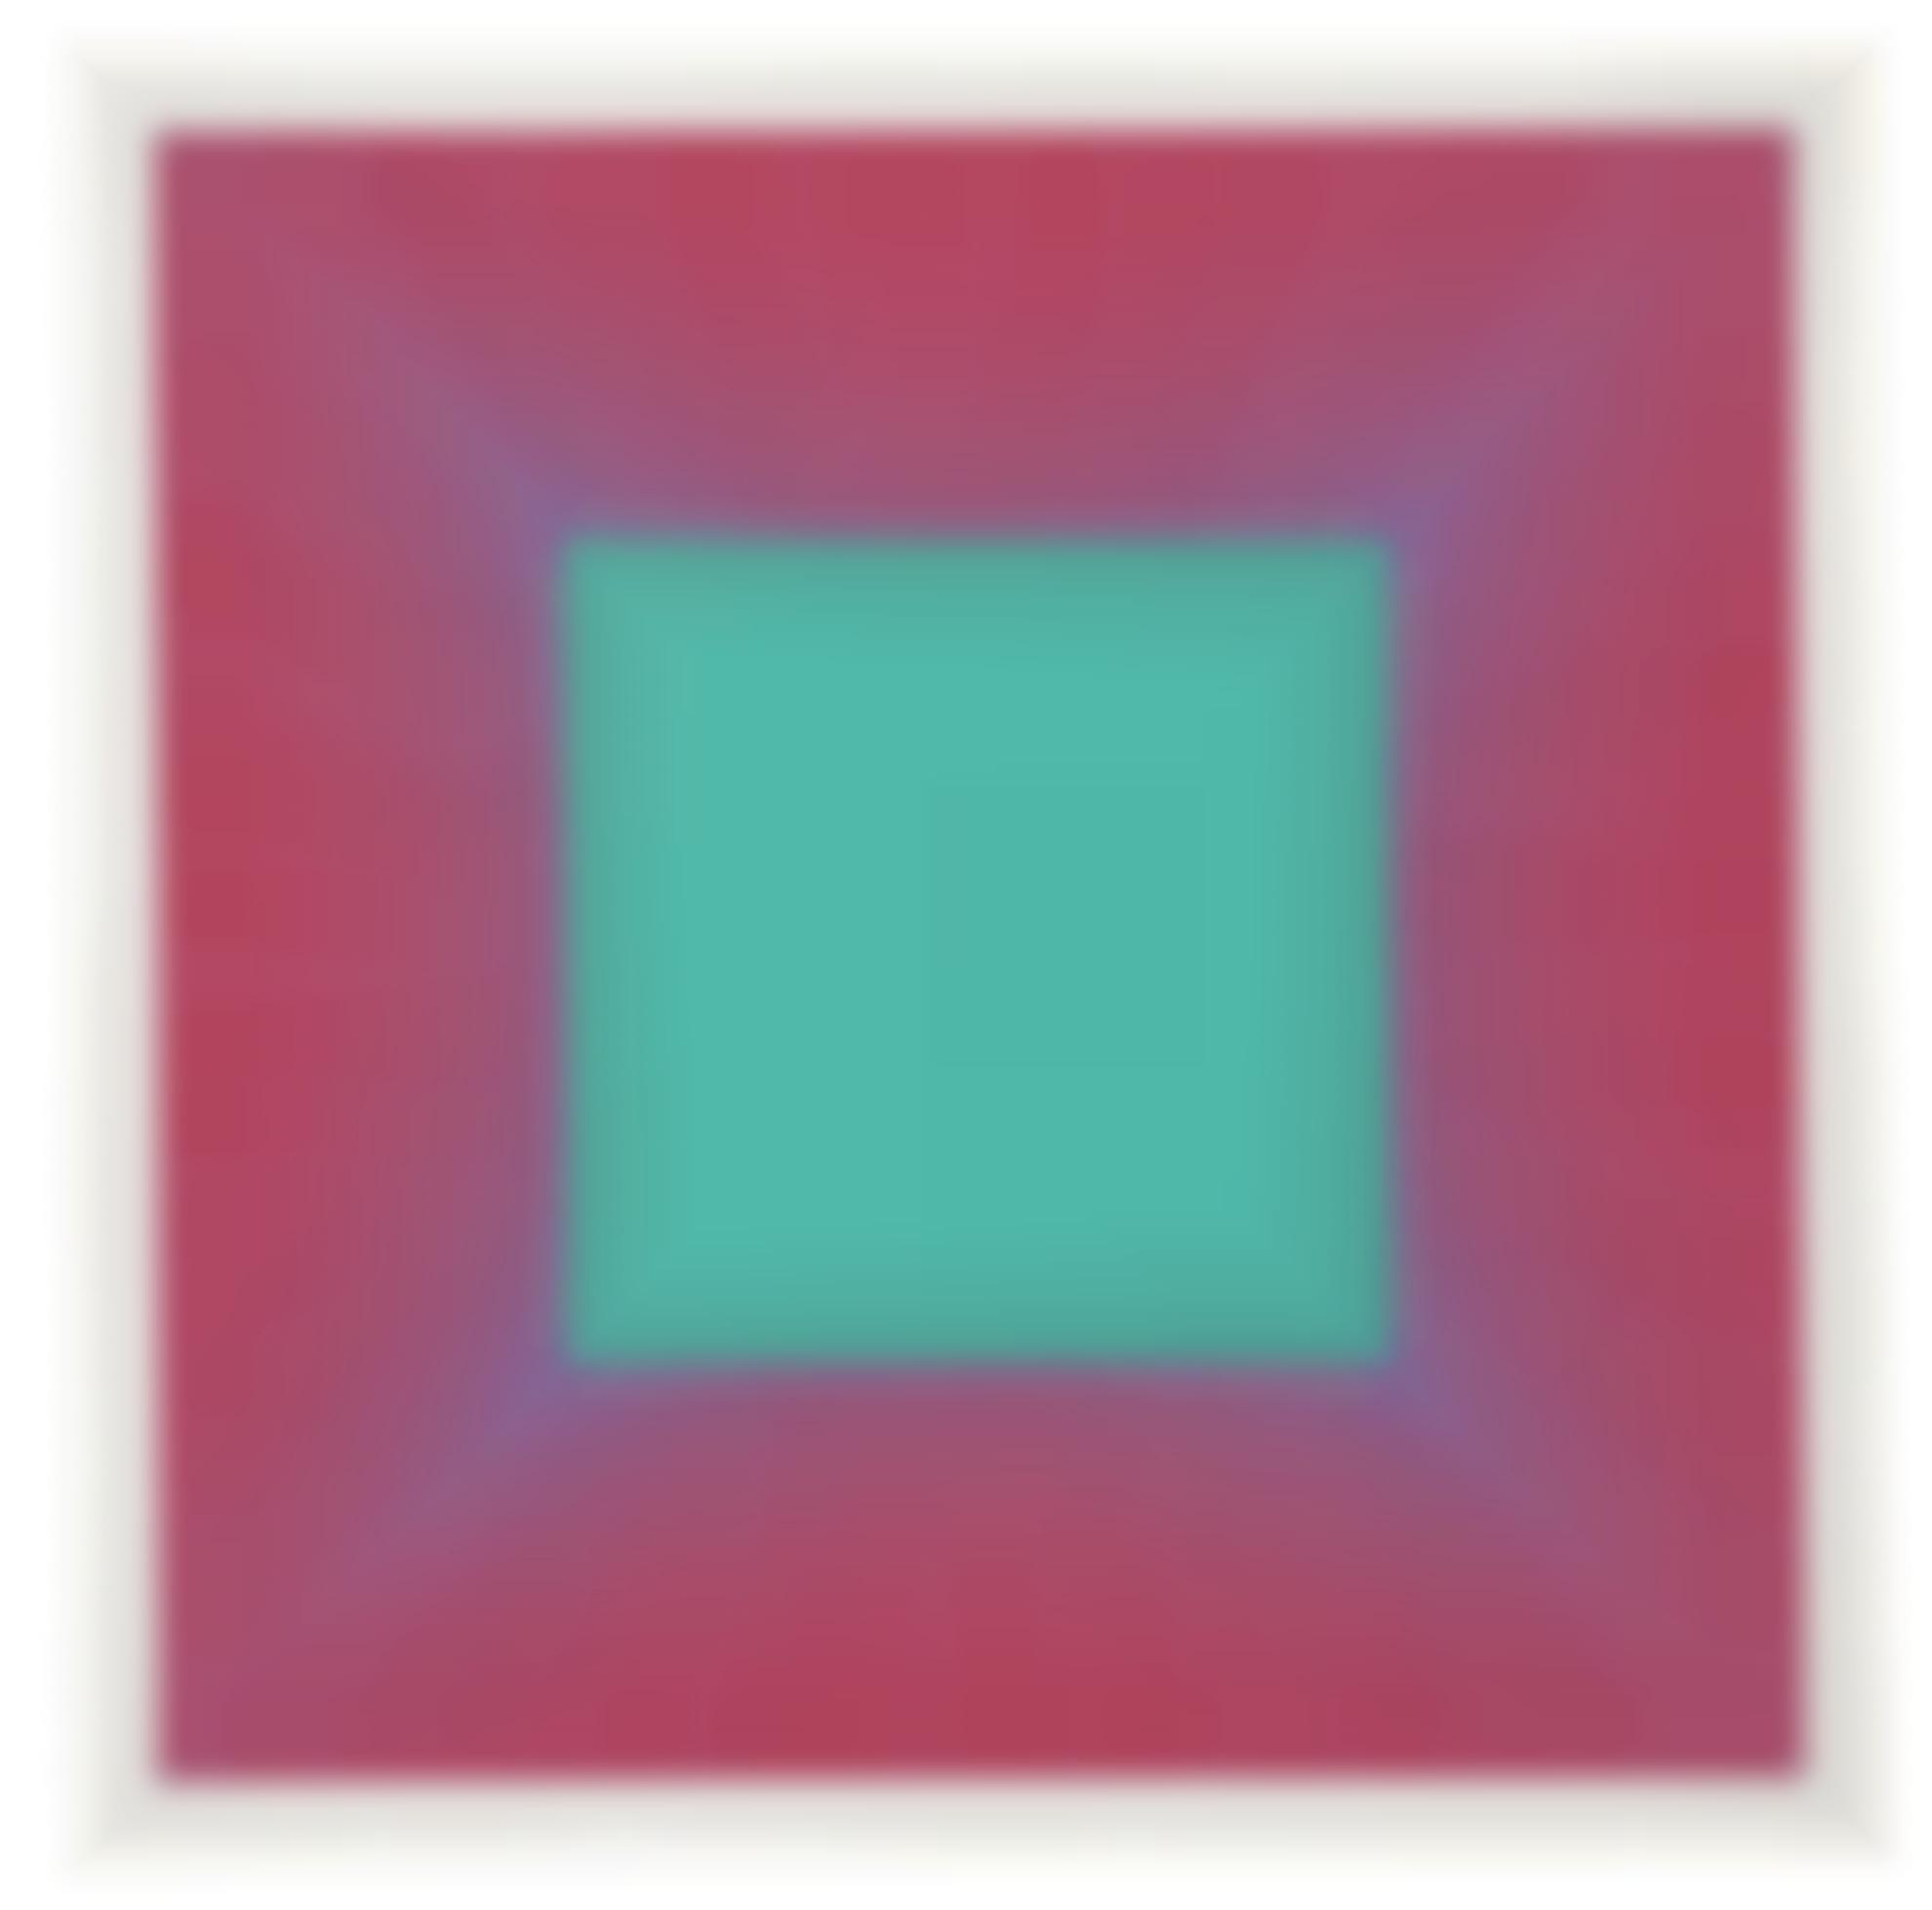 Richard Anuszkiewicz-Deep Emerald Square-1979